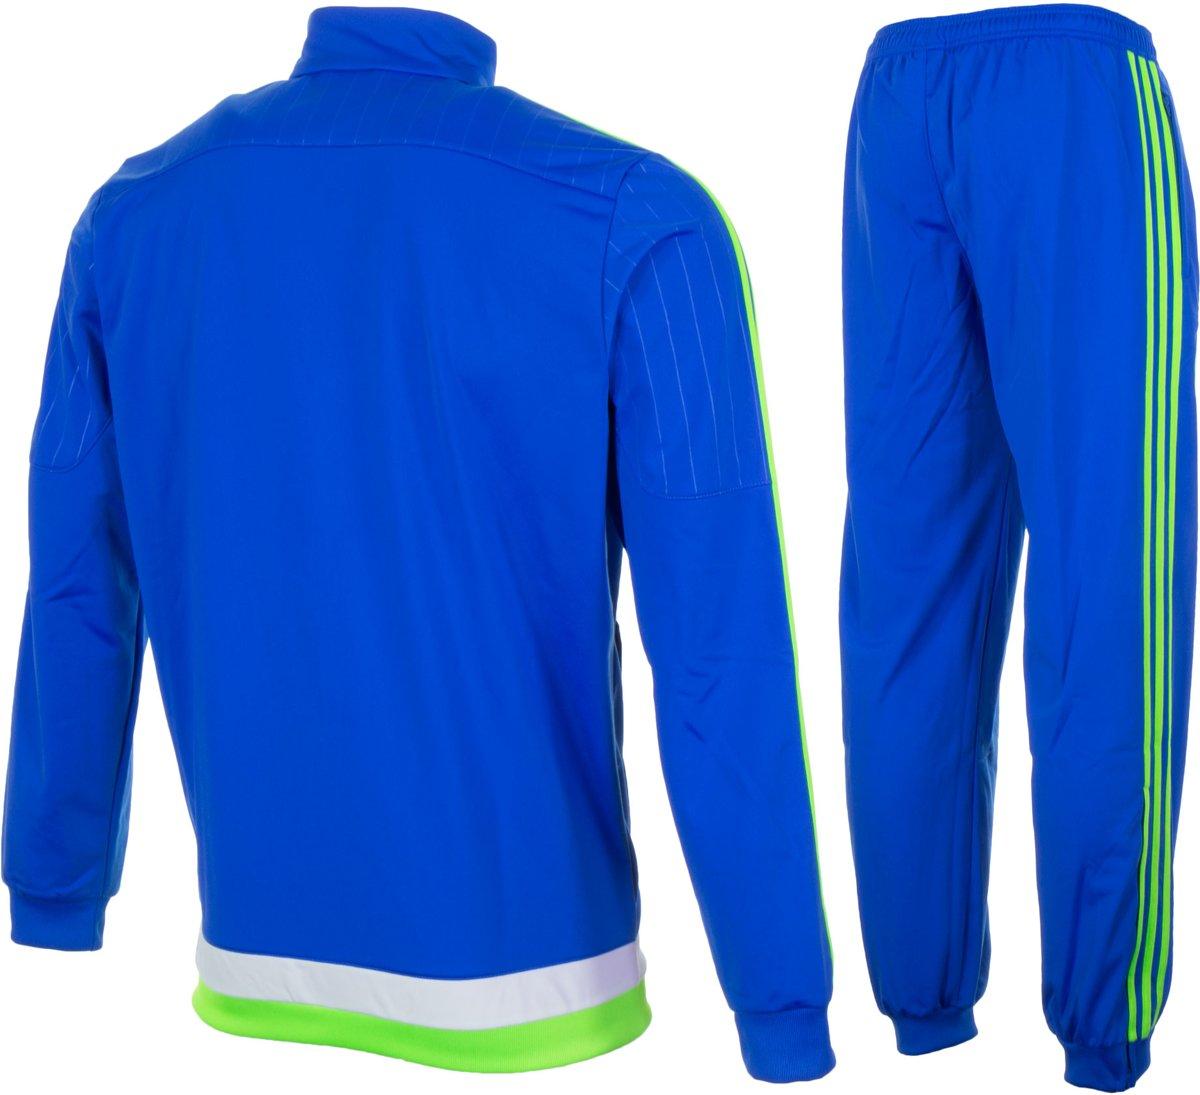 adidas Ajax Trainingspak Trainingspak - Maat XL - Mannen - blauw/groen/wit